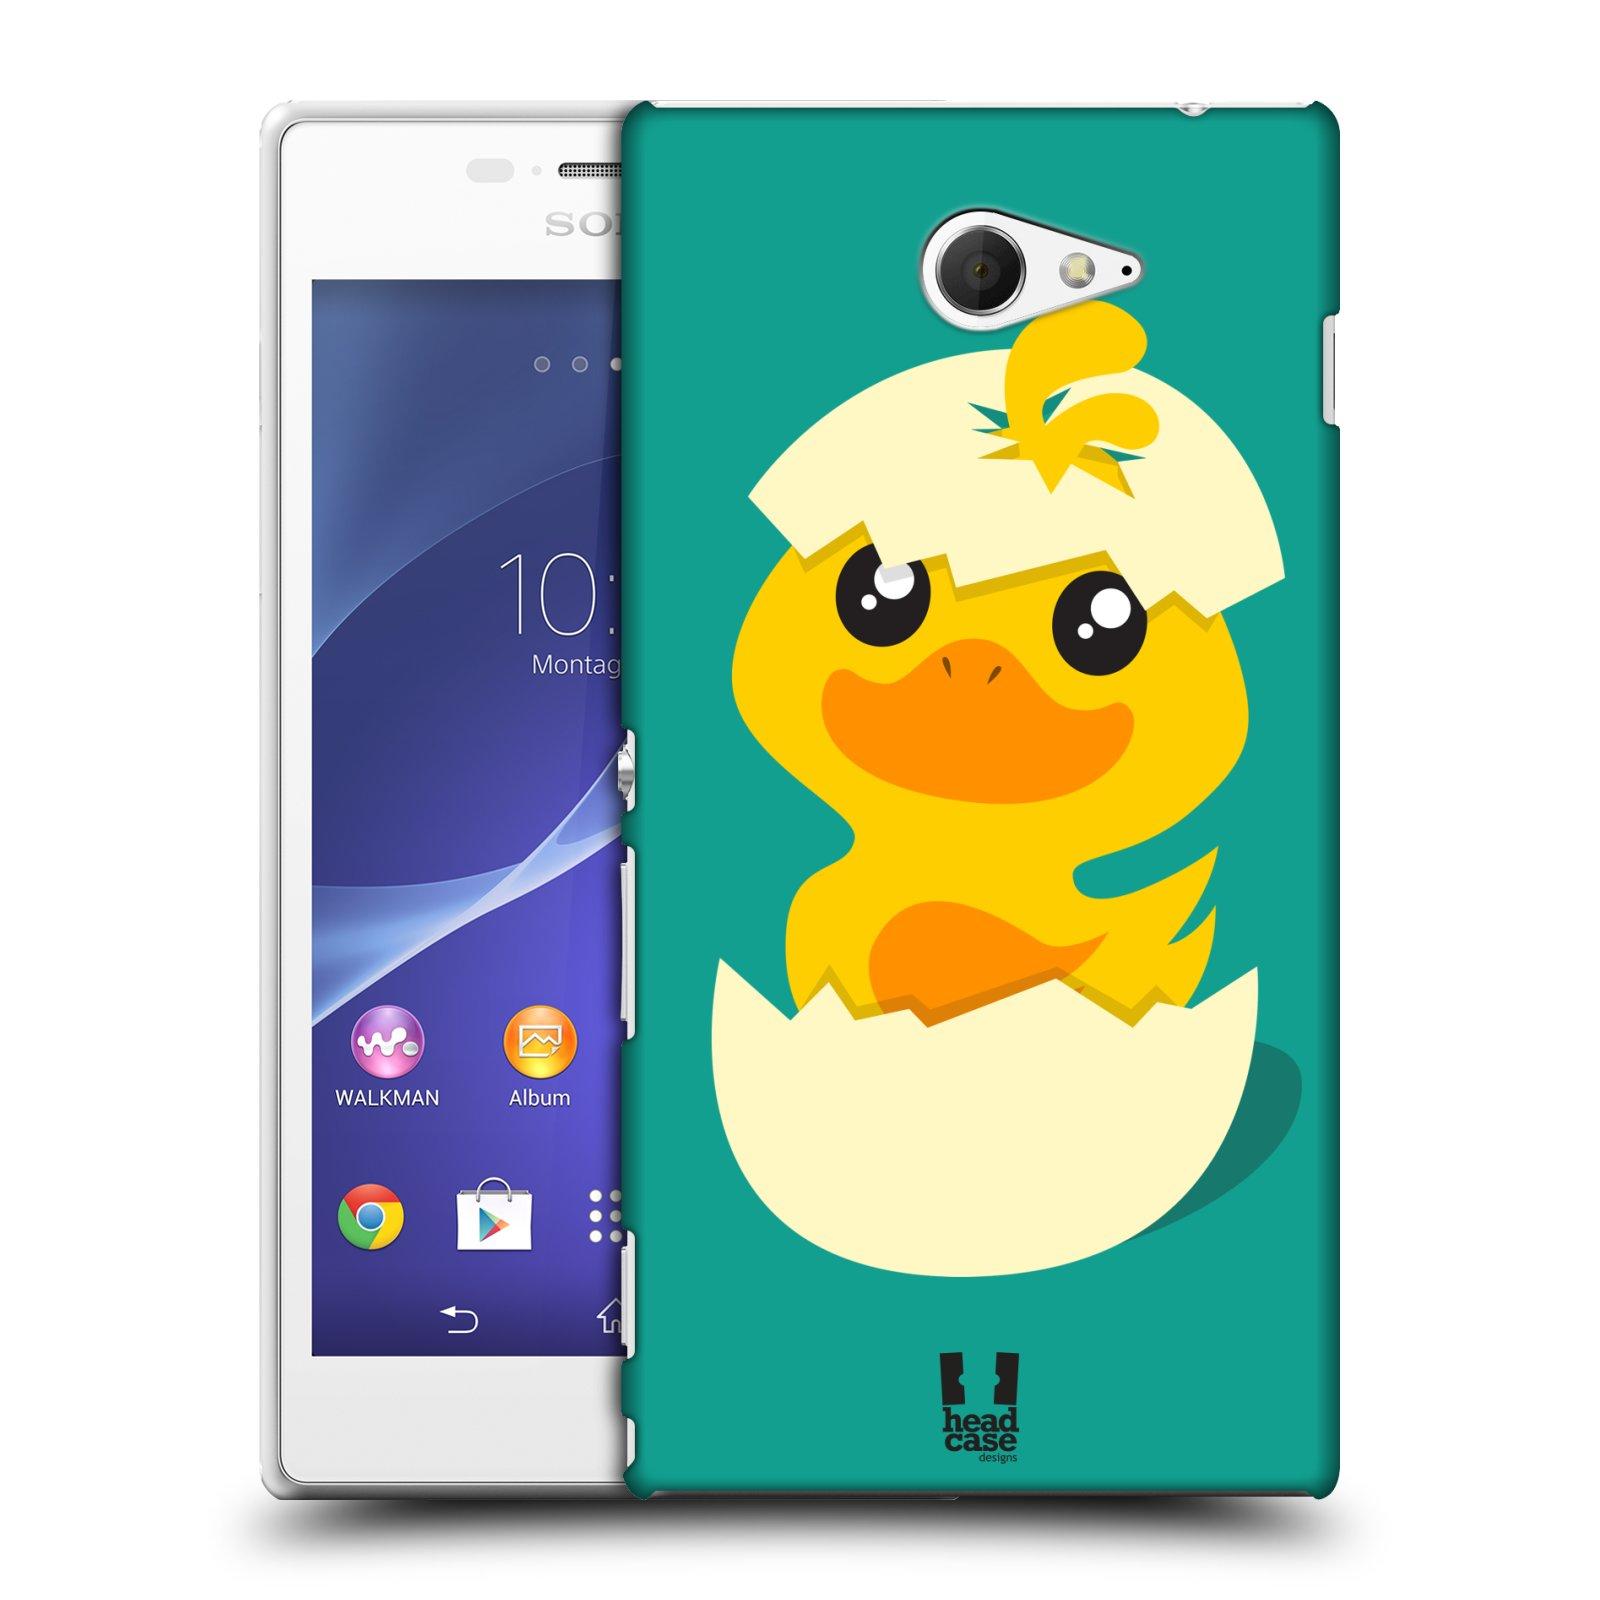 Plastové pouzdro na mobil Sony Xperia M2 D2303 HEAD CASE KACHNIČKA Z VAJÍČKA (Kryt či obal na mobilní telefon Sony Xperia M2 )